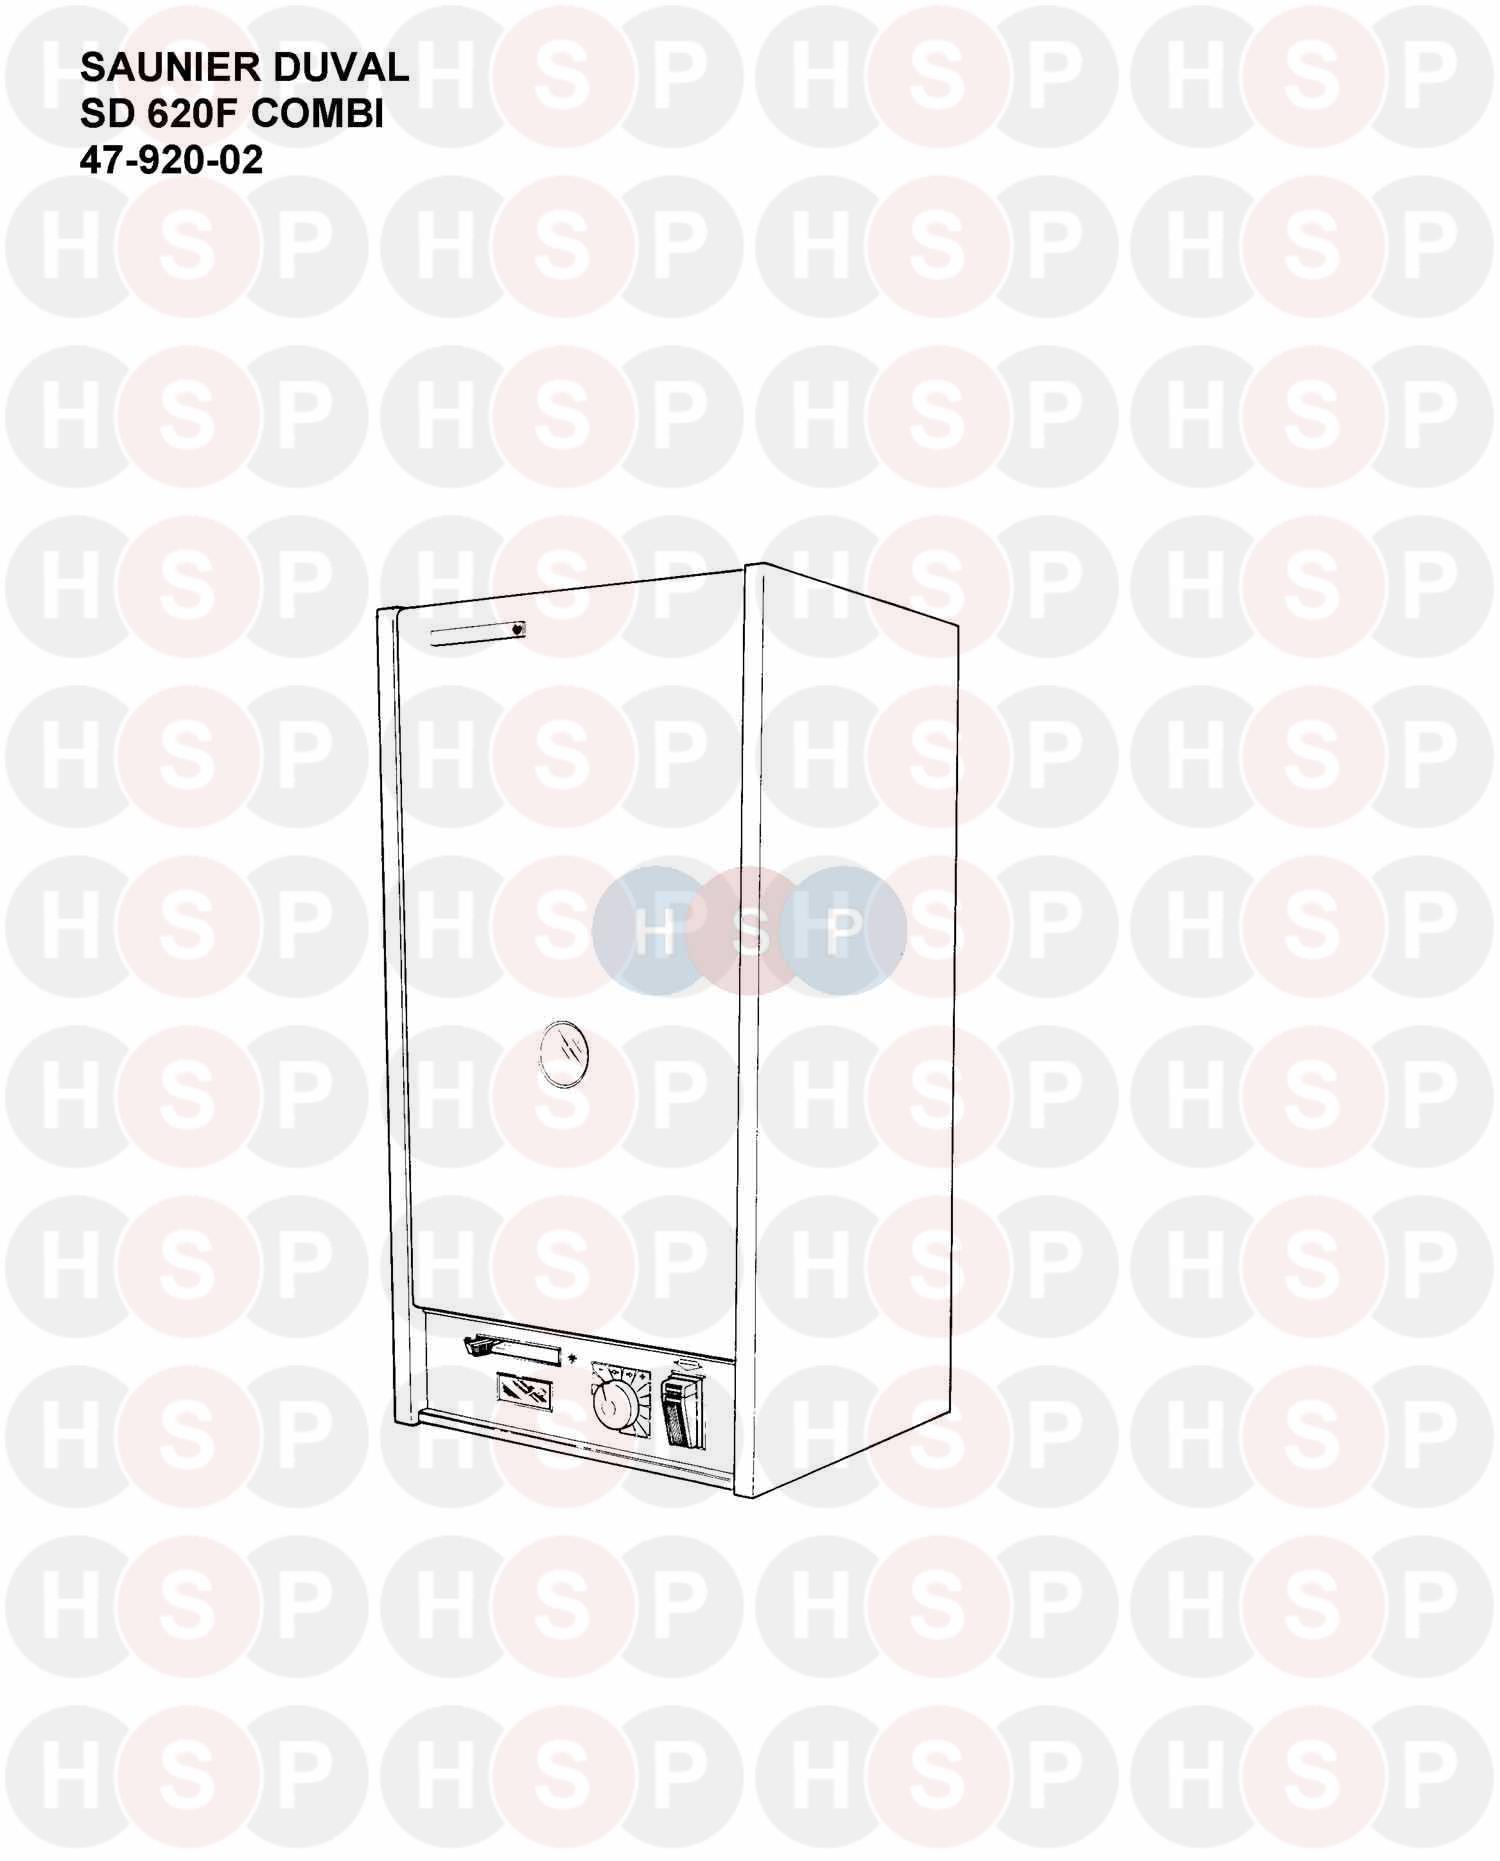 saunier duval sd 620f combi appliance diagram  appliance overview